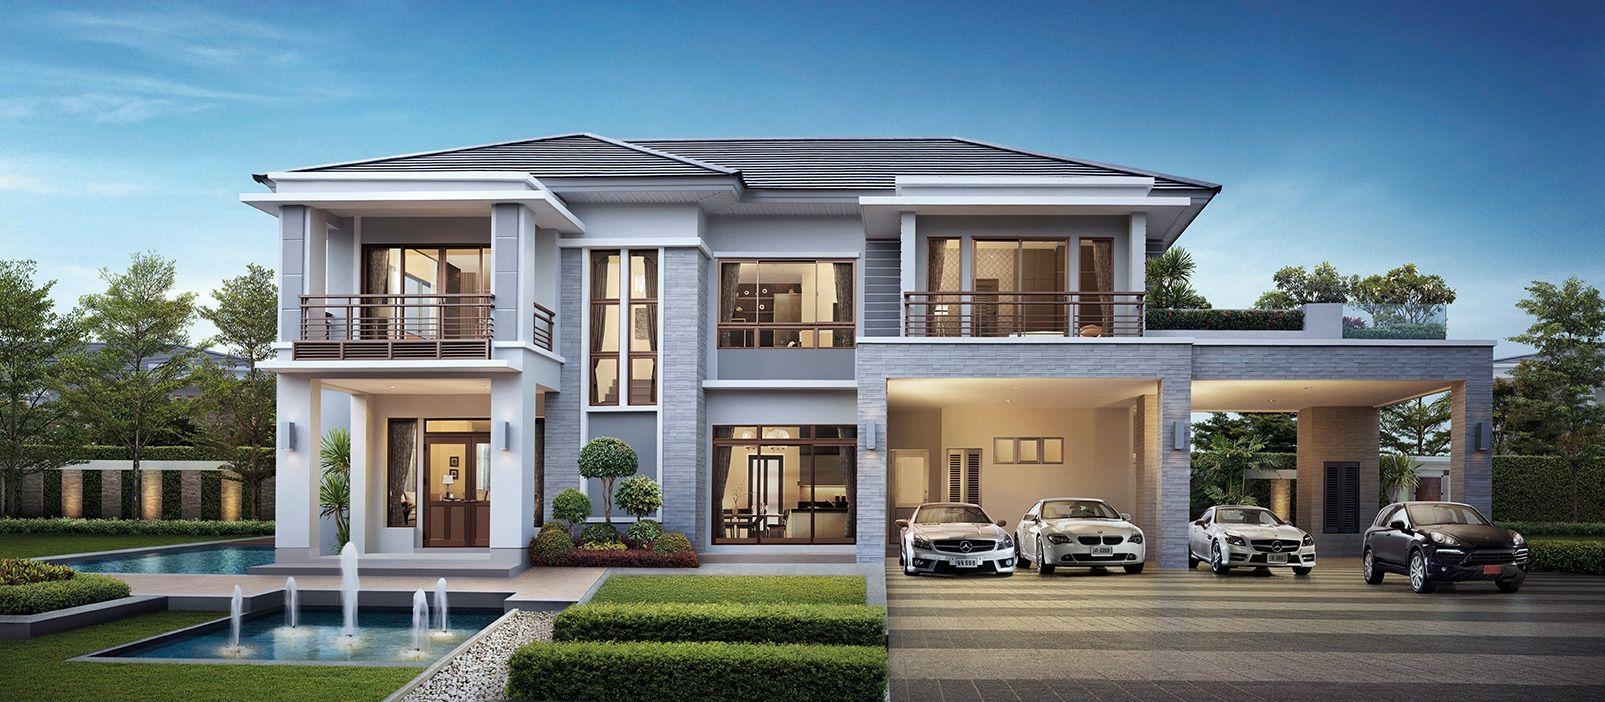 Luxury Bungalow House Design Beautiful House Plans Modern House Facades